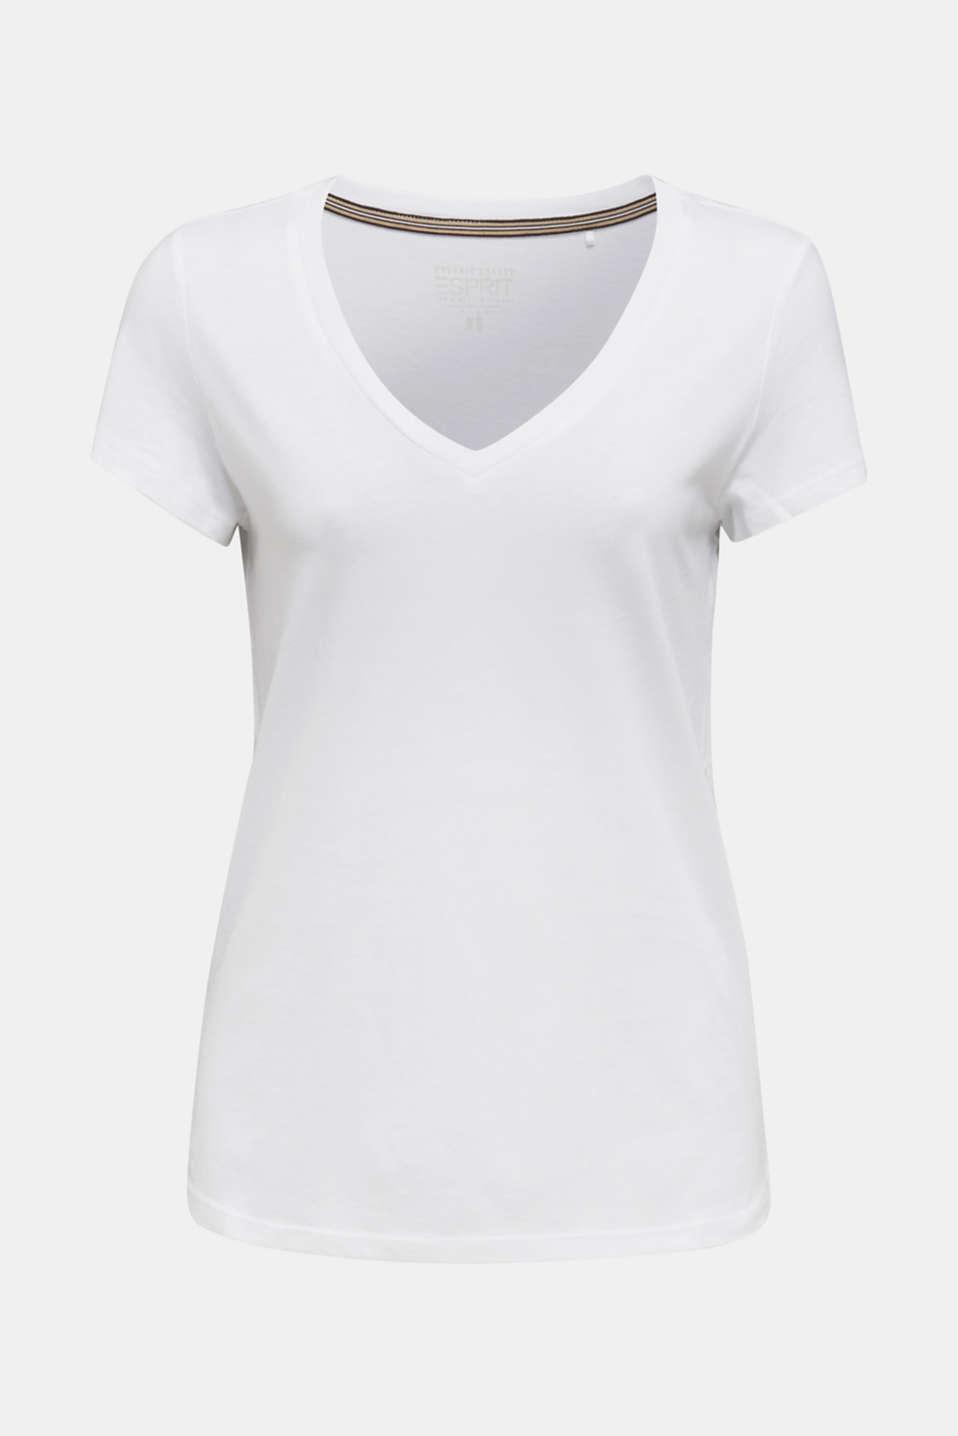 V-neck top made of blended cotton, WHITE, detail image number 5